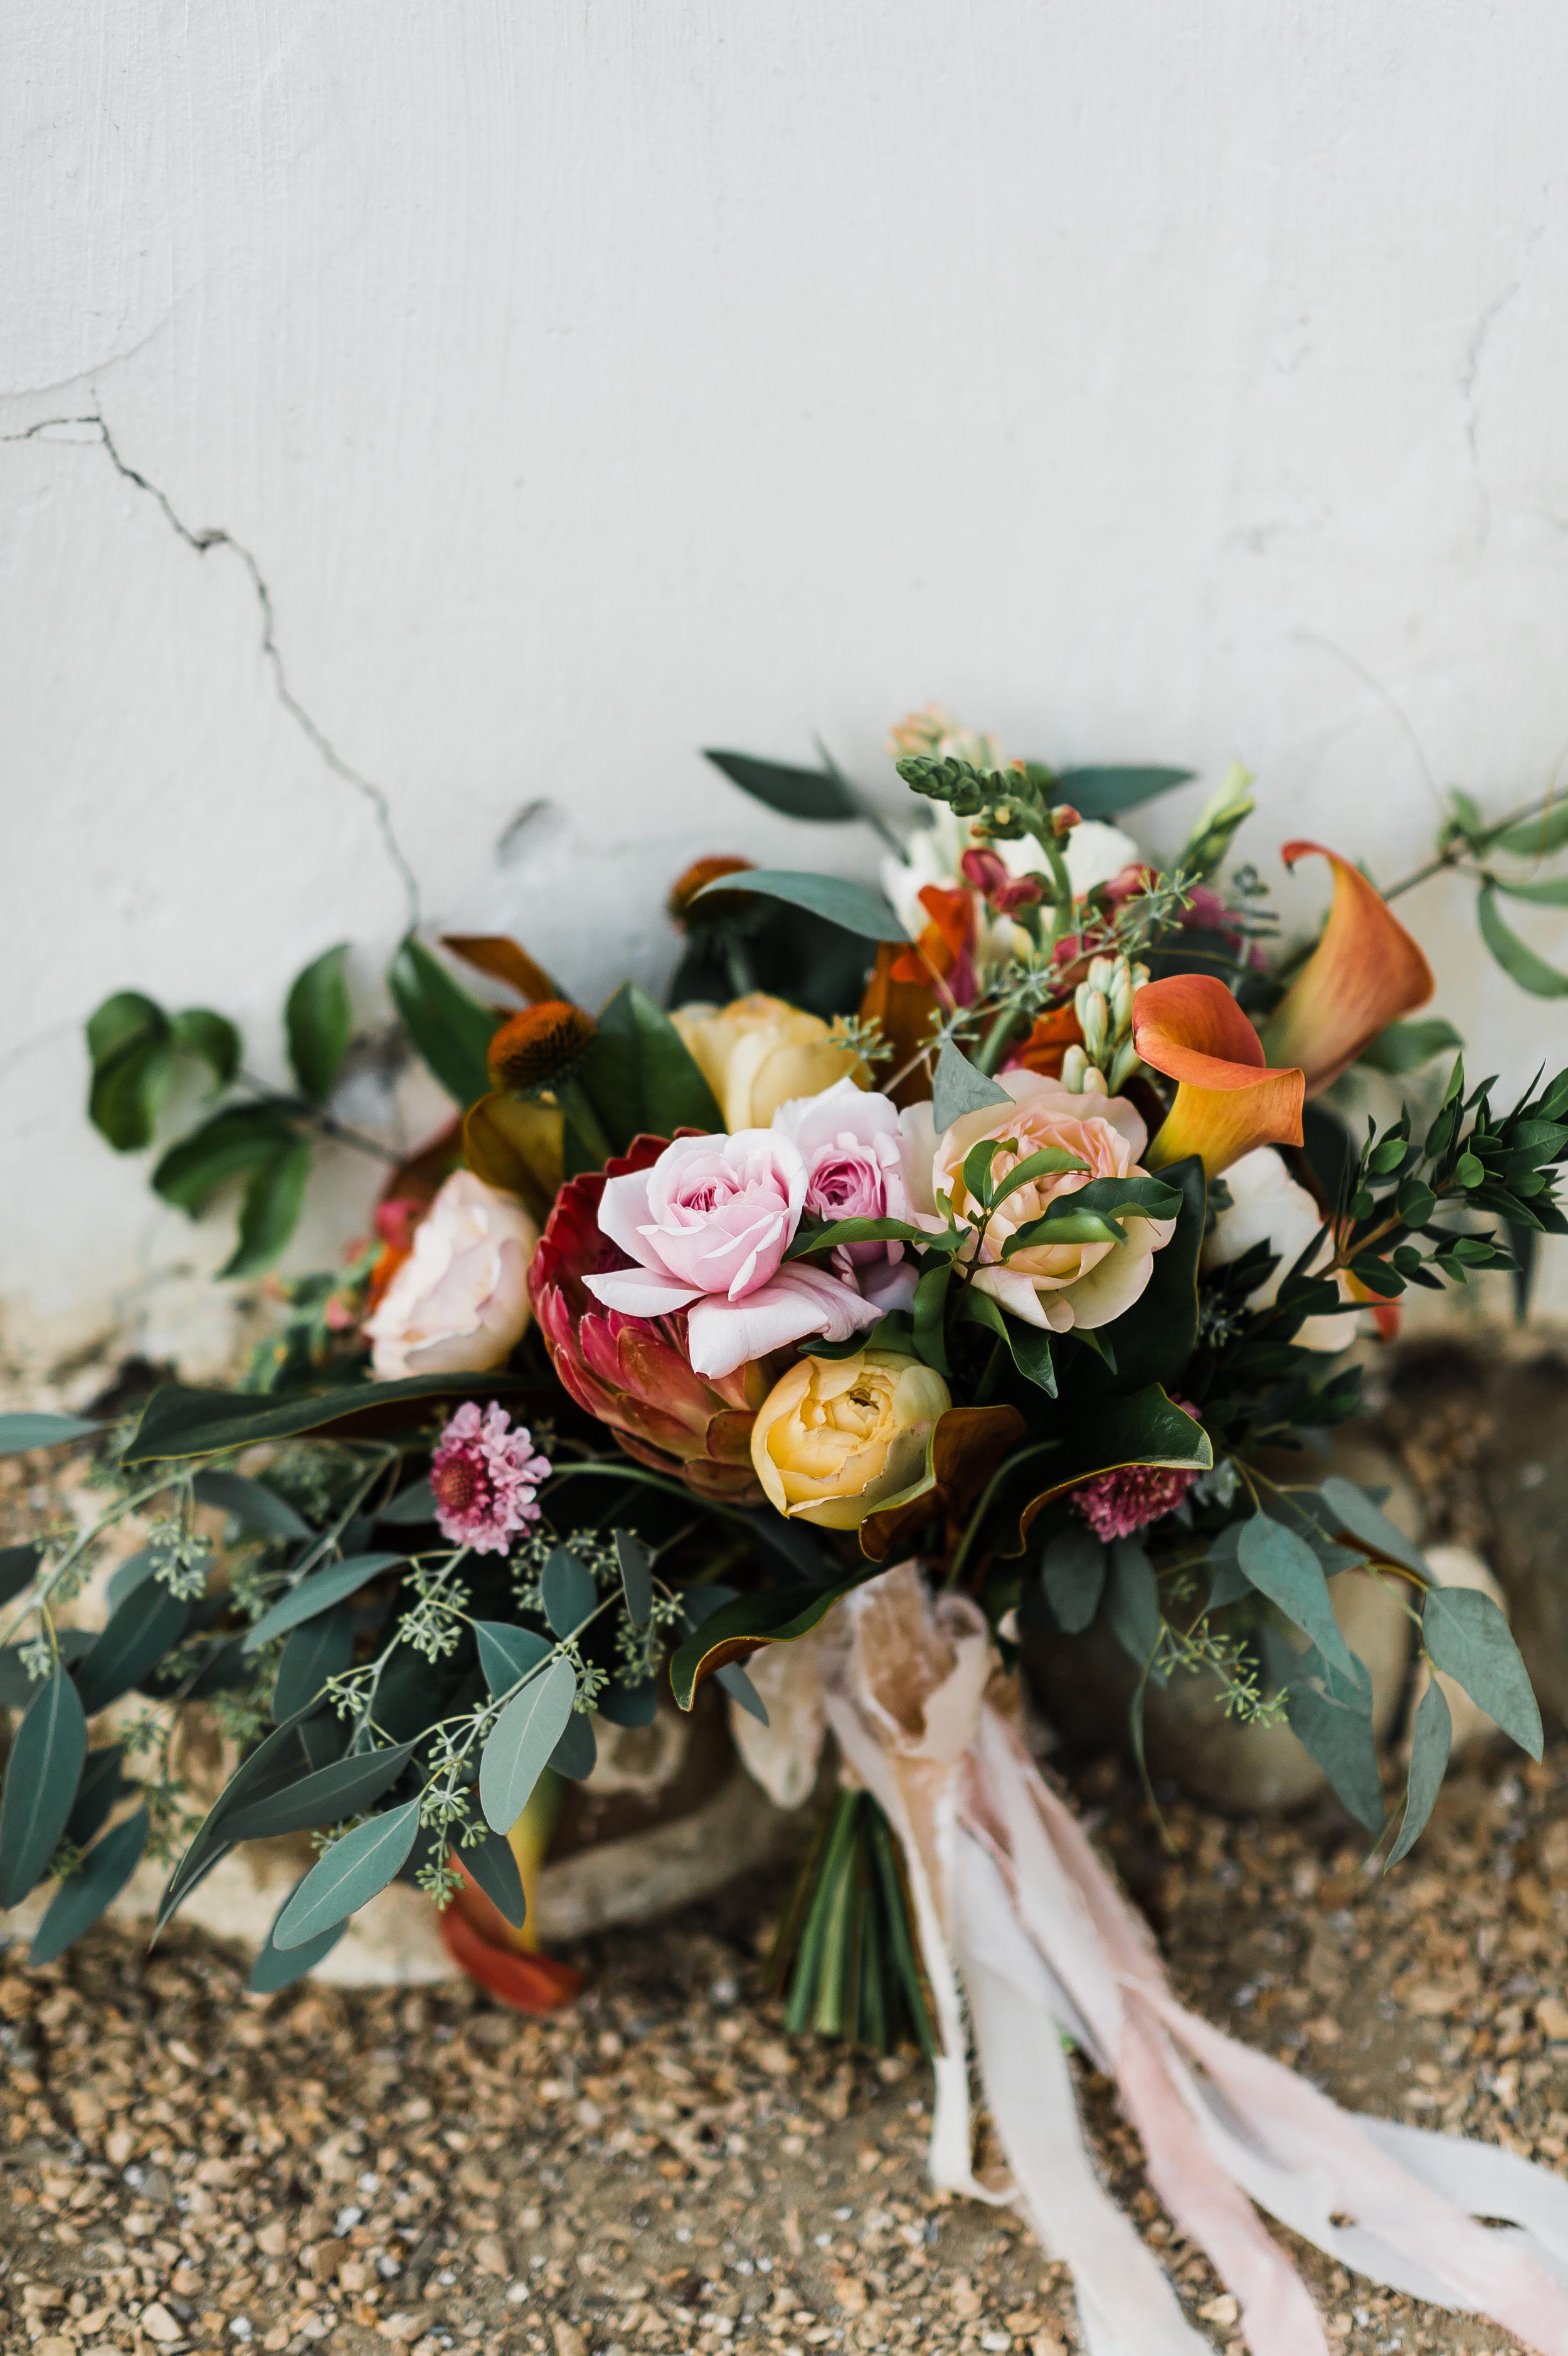 www.santabarbarawedding.com | Michelle Ramirez Photography | Olivas Adobe | Karen Marie Events | Tangled Lotus | Honey Silks & Co | Bride's Bouquet